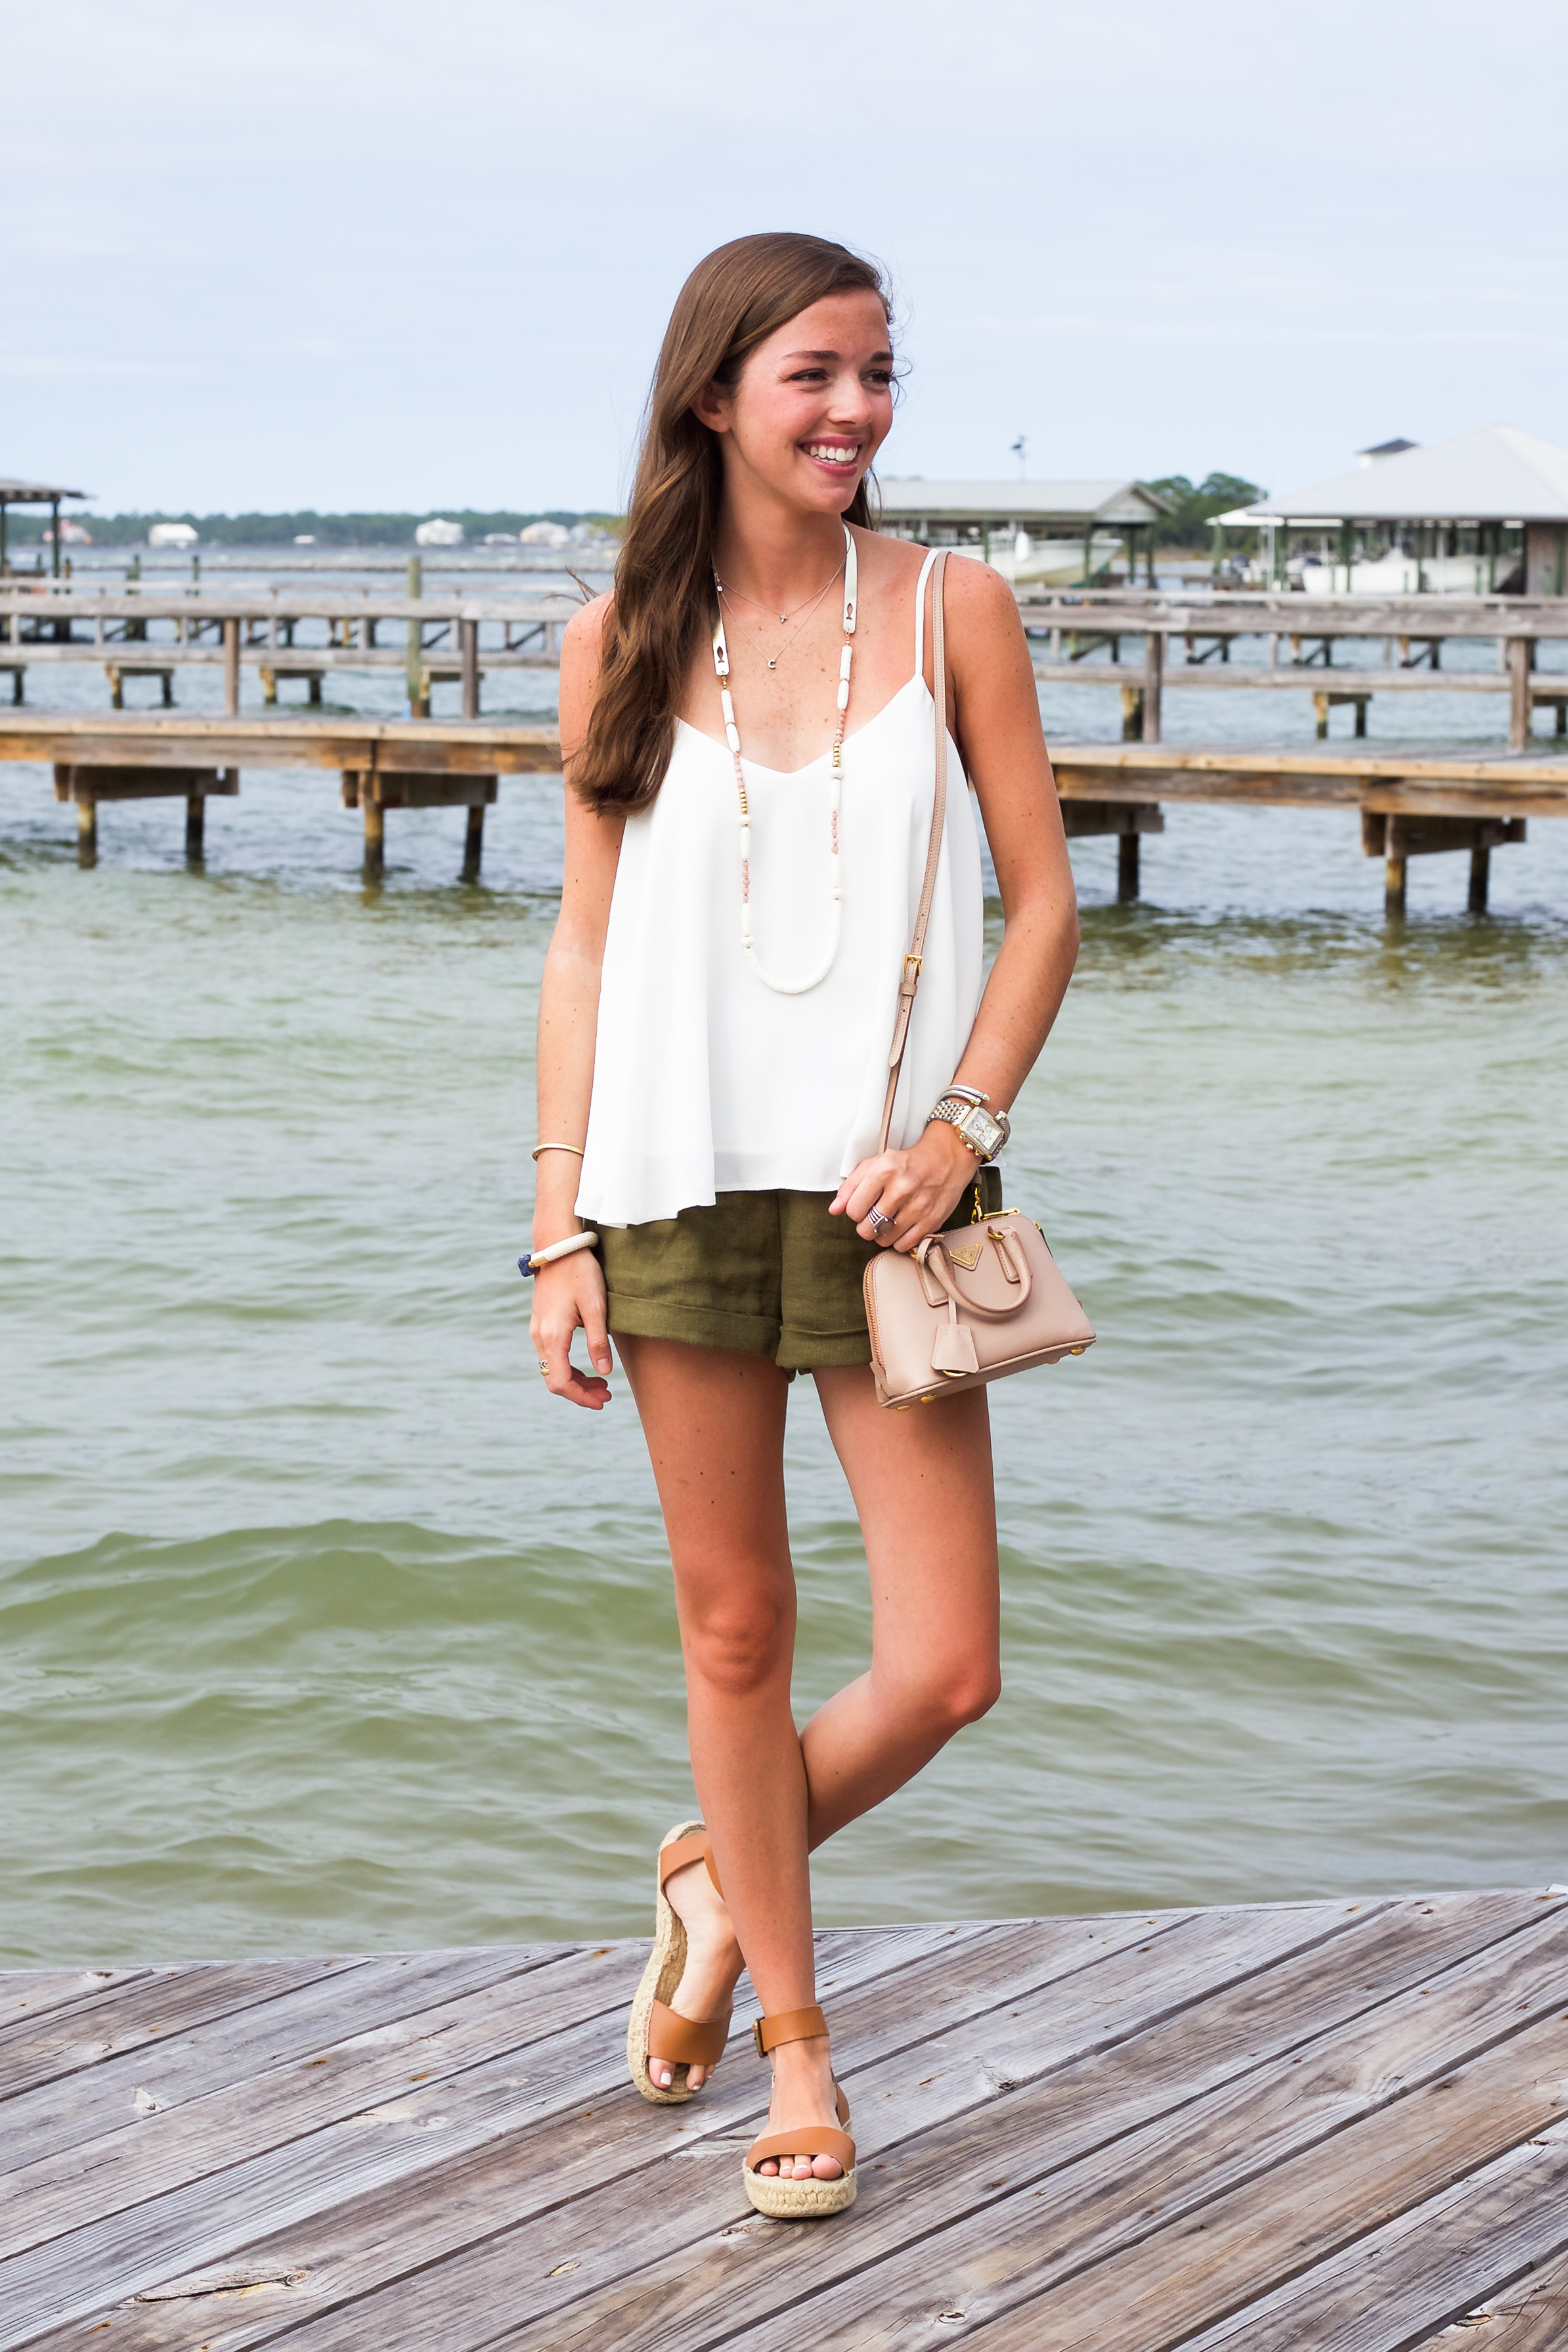 fashion blogger lcb style beach soludos topshop (7 of 21).jpg